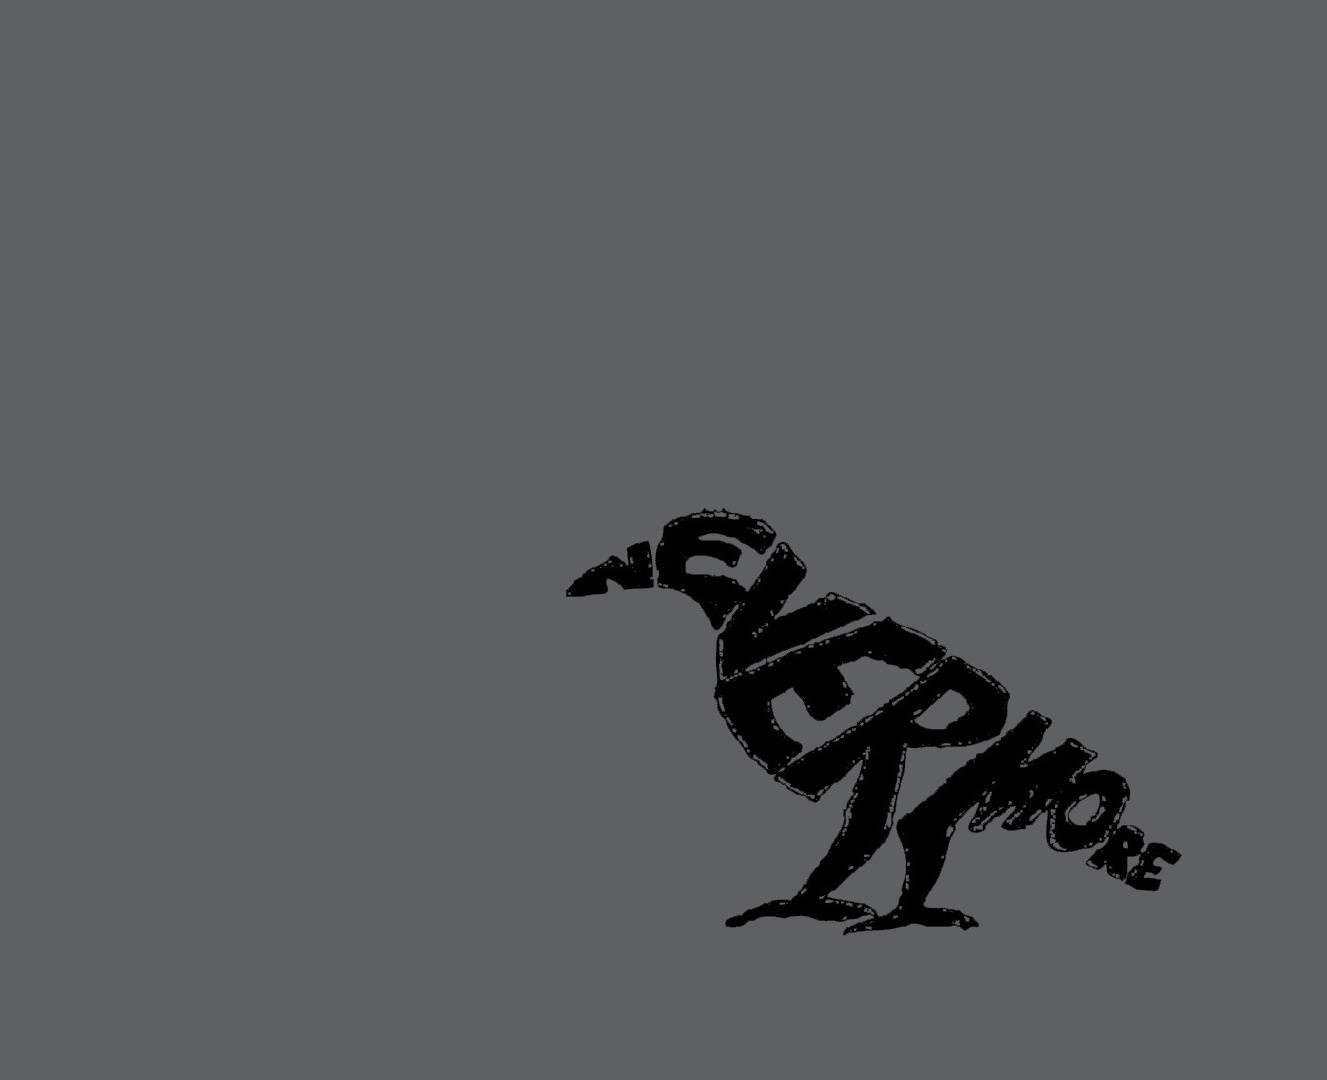 Artistic Crow